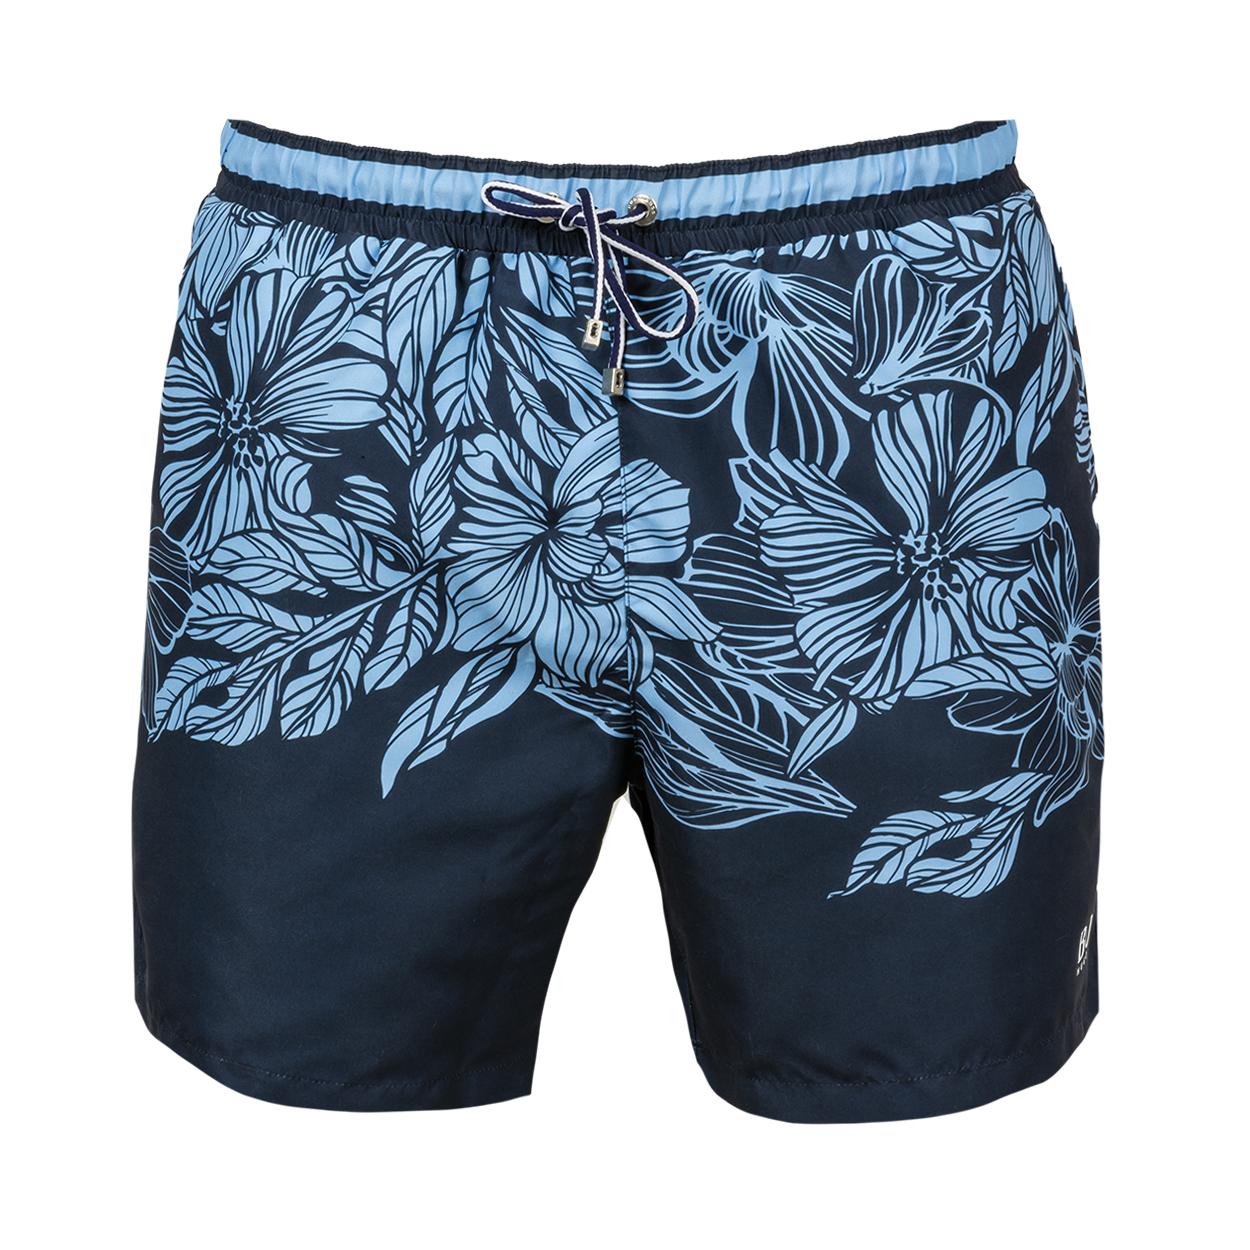 Short de bain  barracuda bleu foncé à motifs fleurs et feuilles bleu ciel